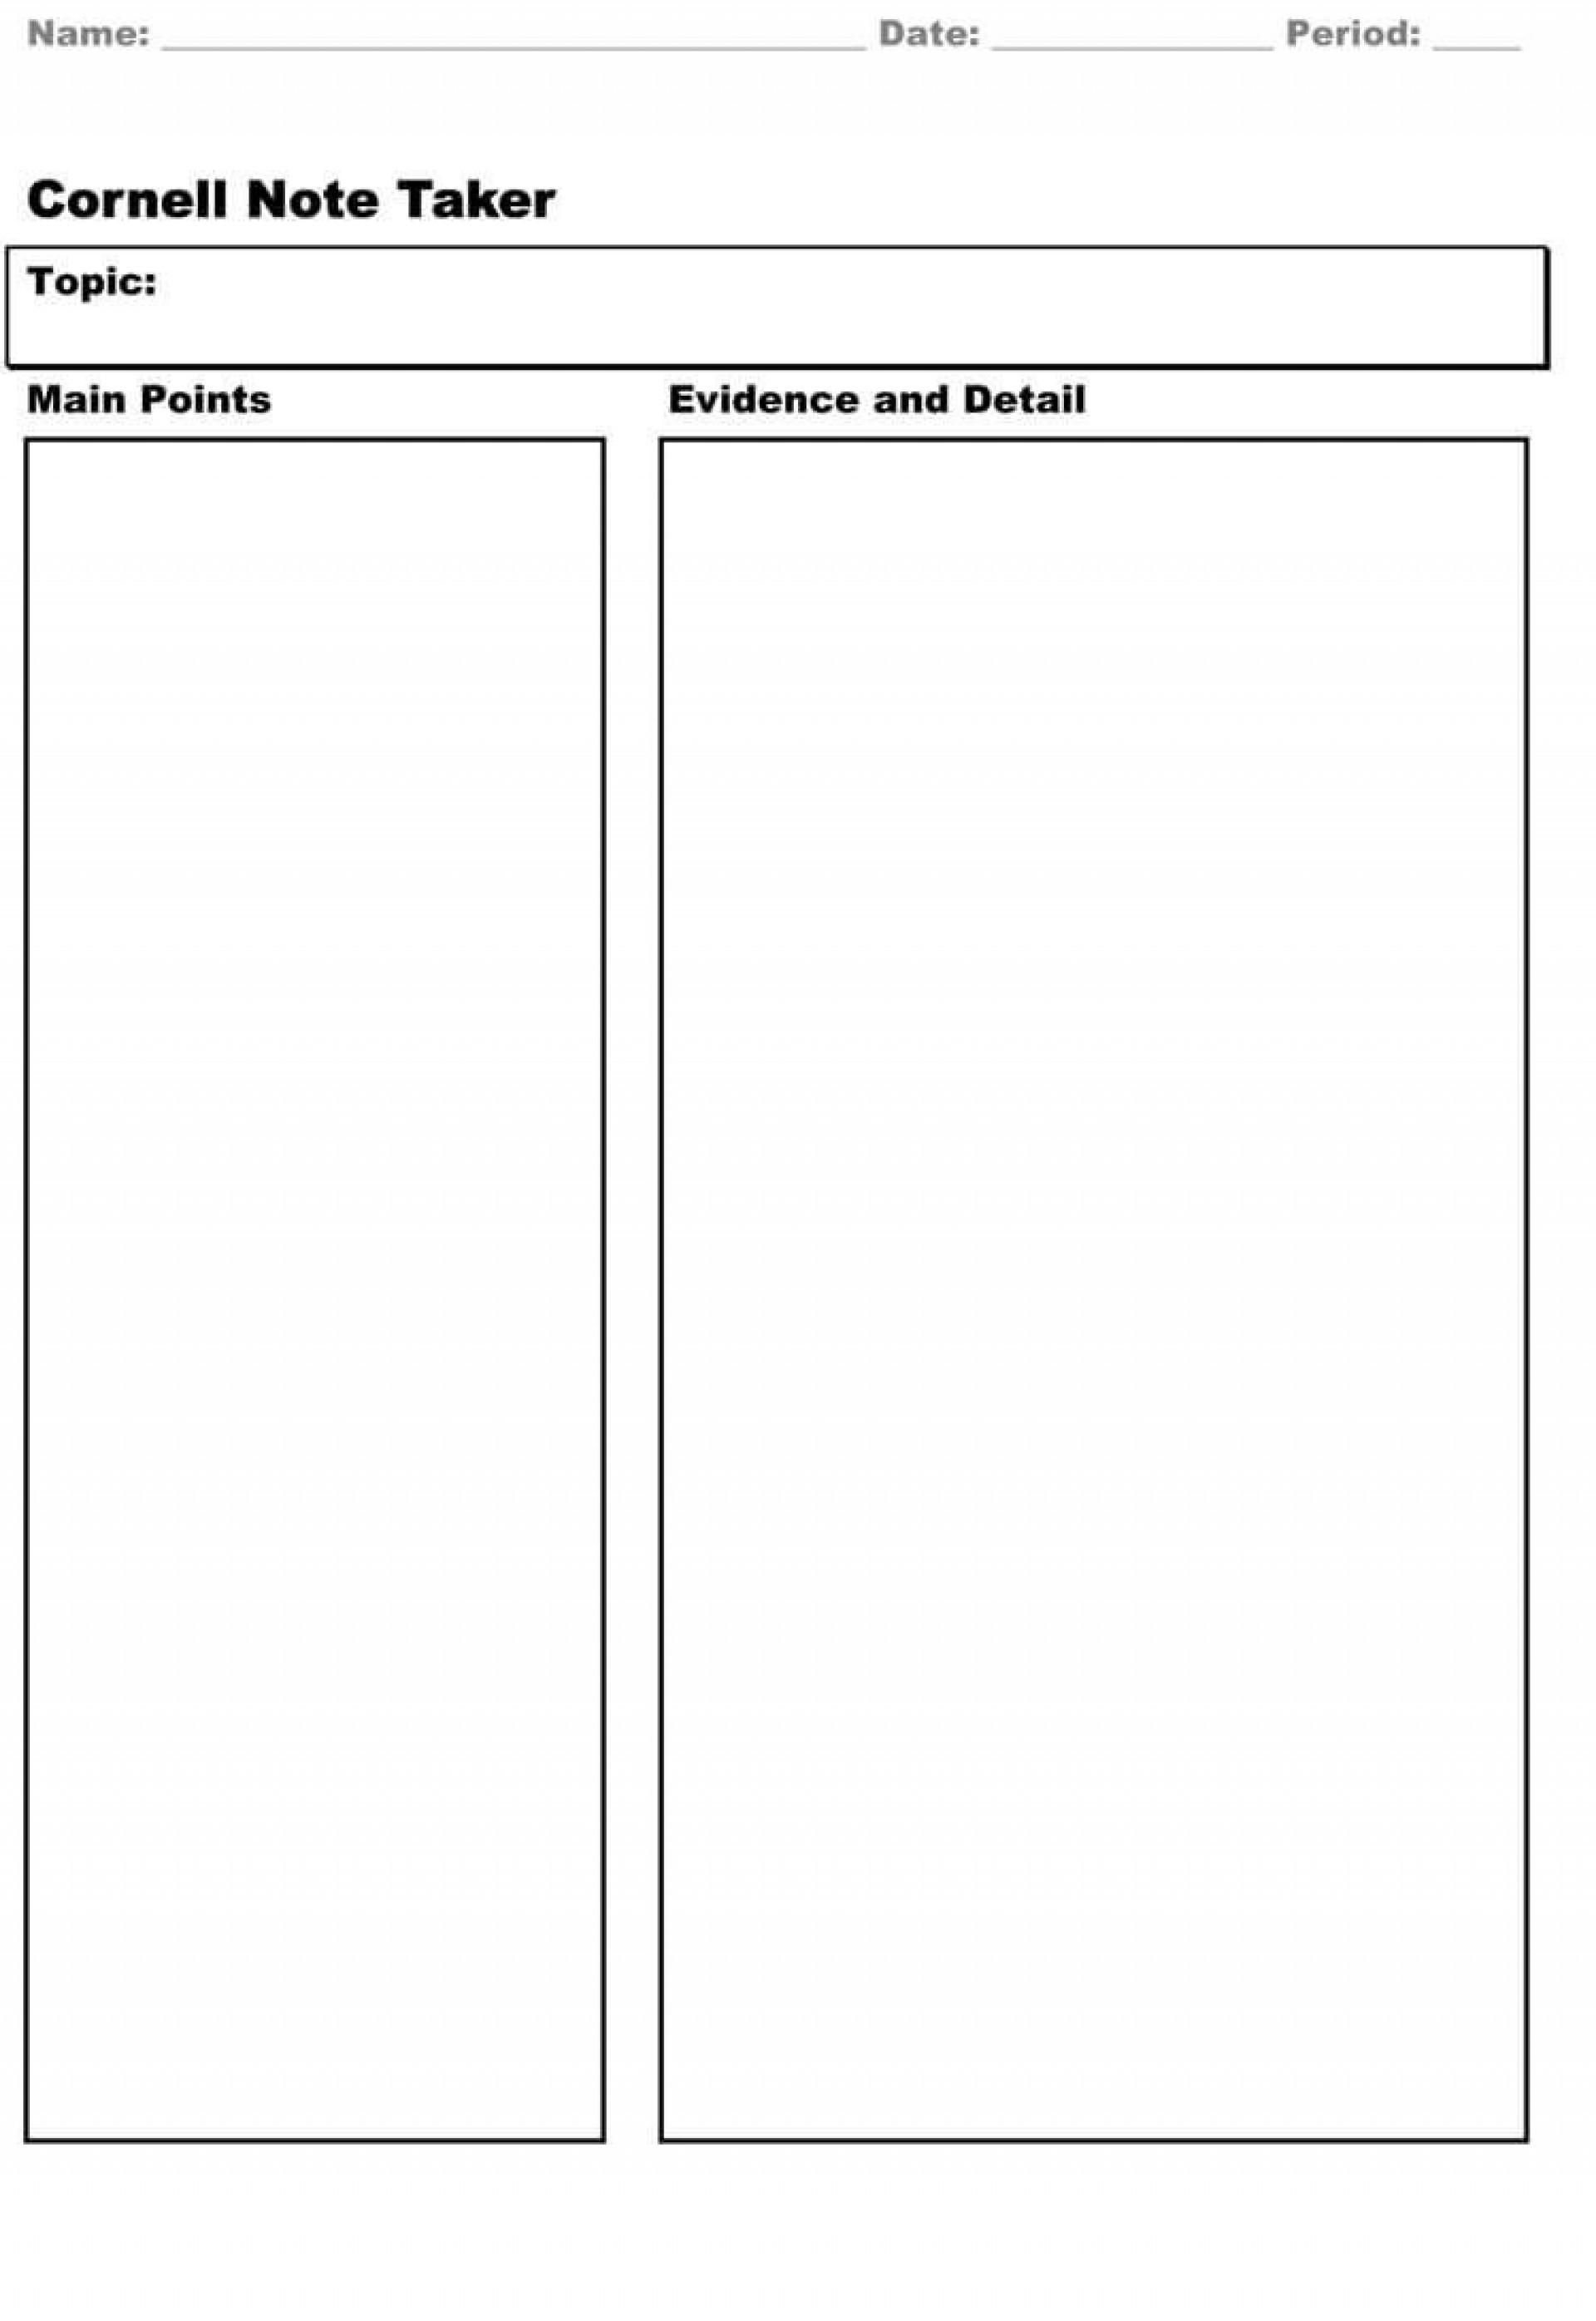 008 Fantastic Note Taking Template Pdf Idea  Free Cornell Example1920